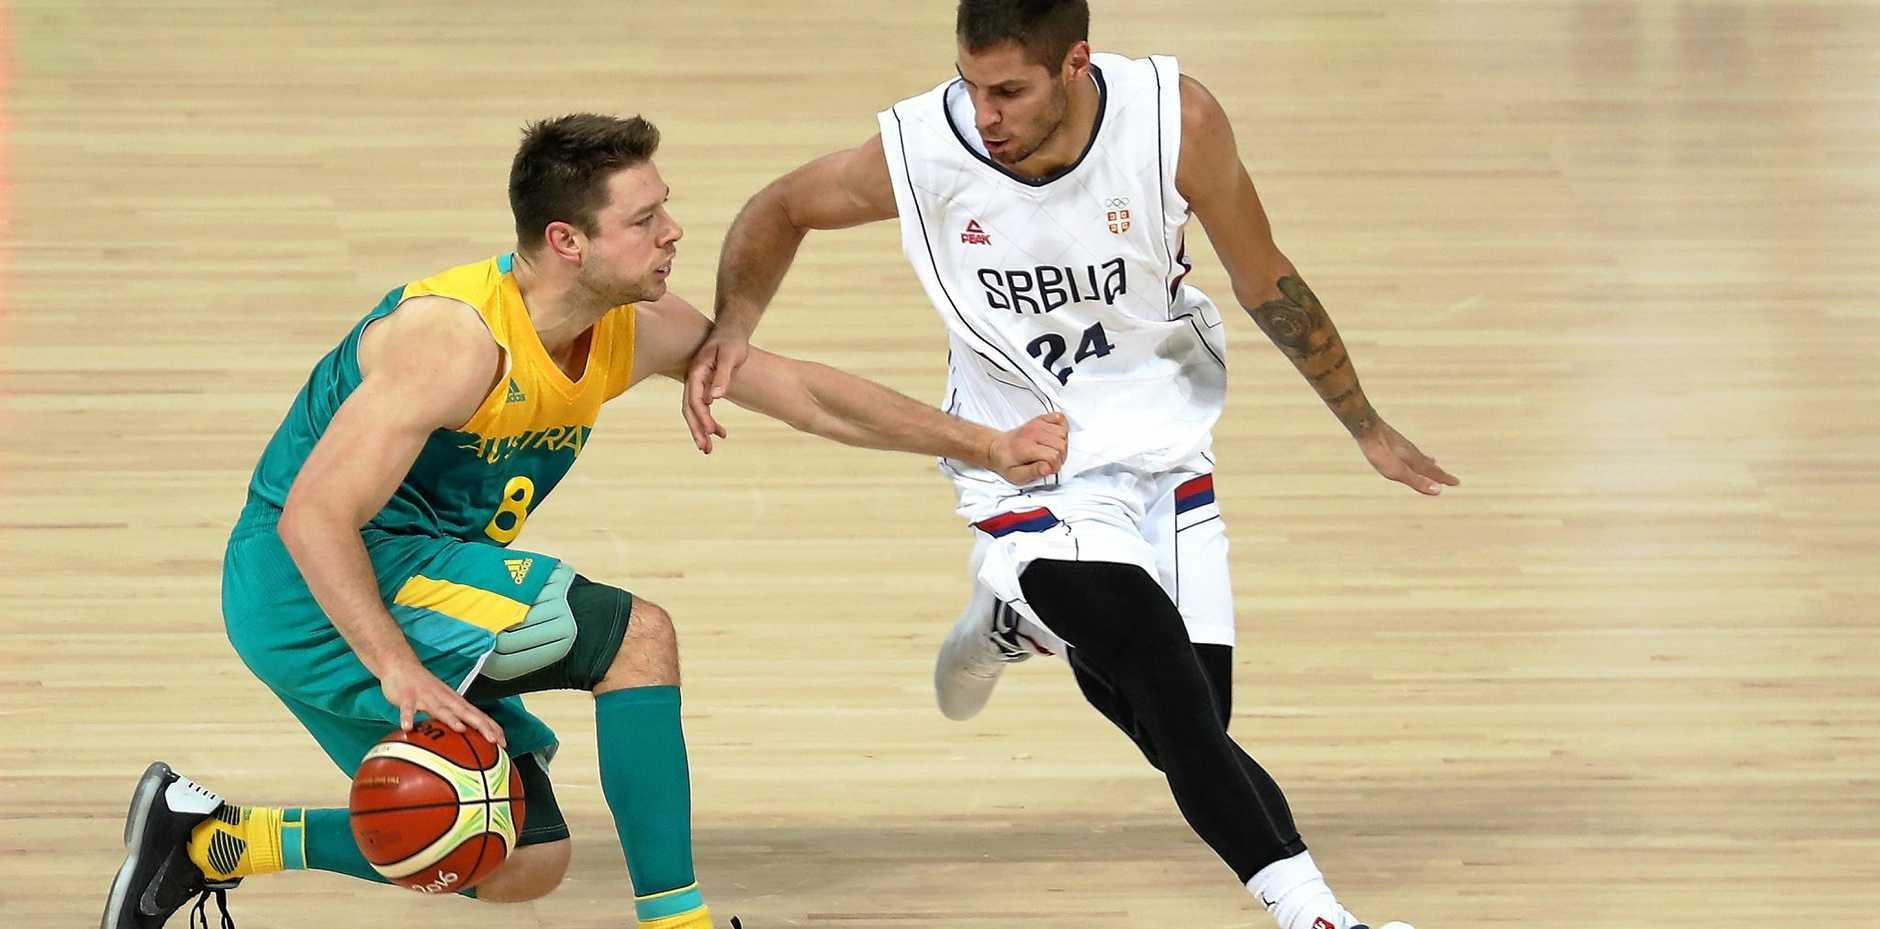 Matthew Dellavedova dribbles against Stefan Jovic of Serbia.